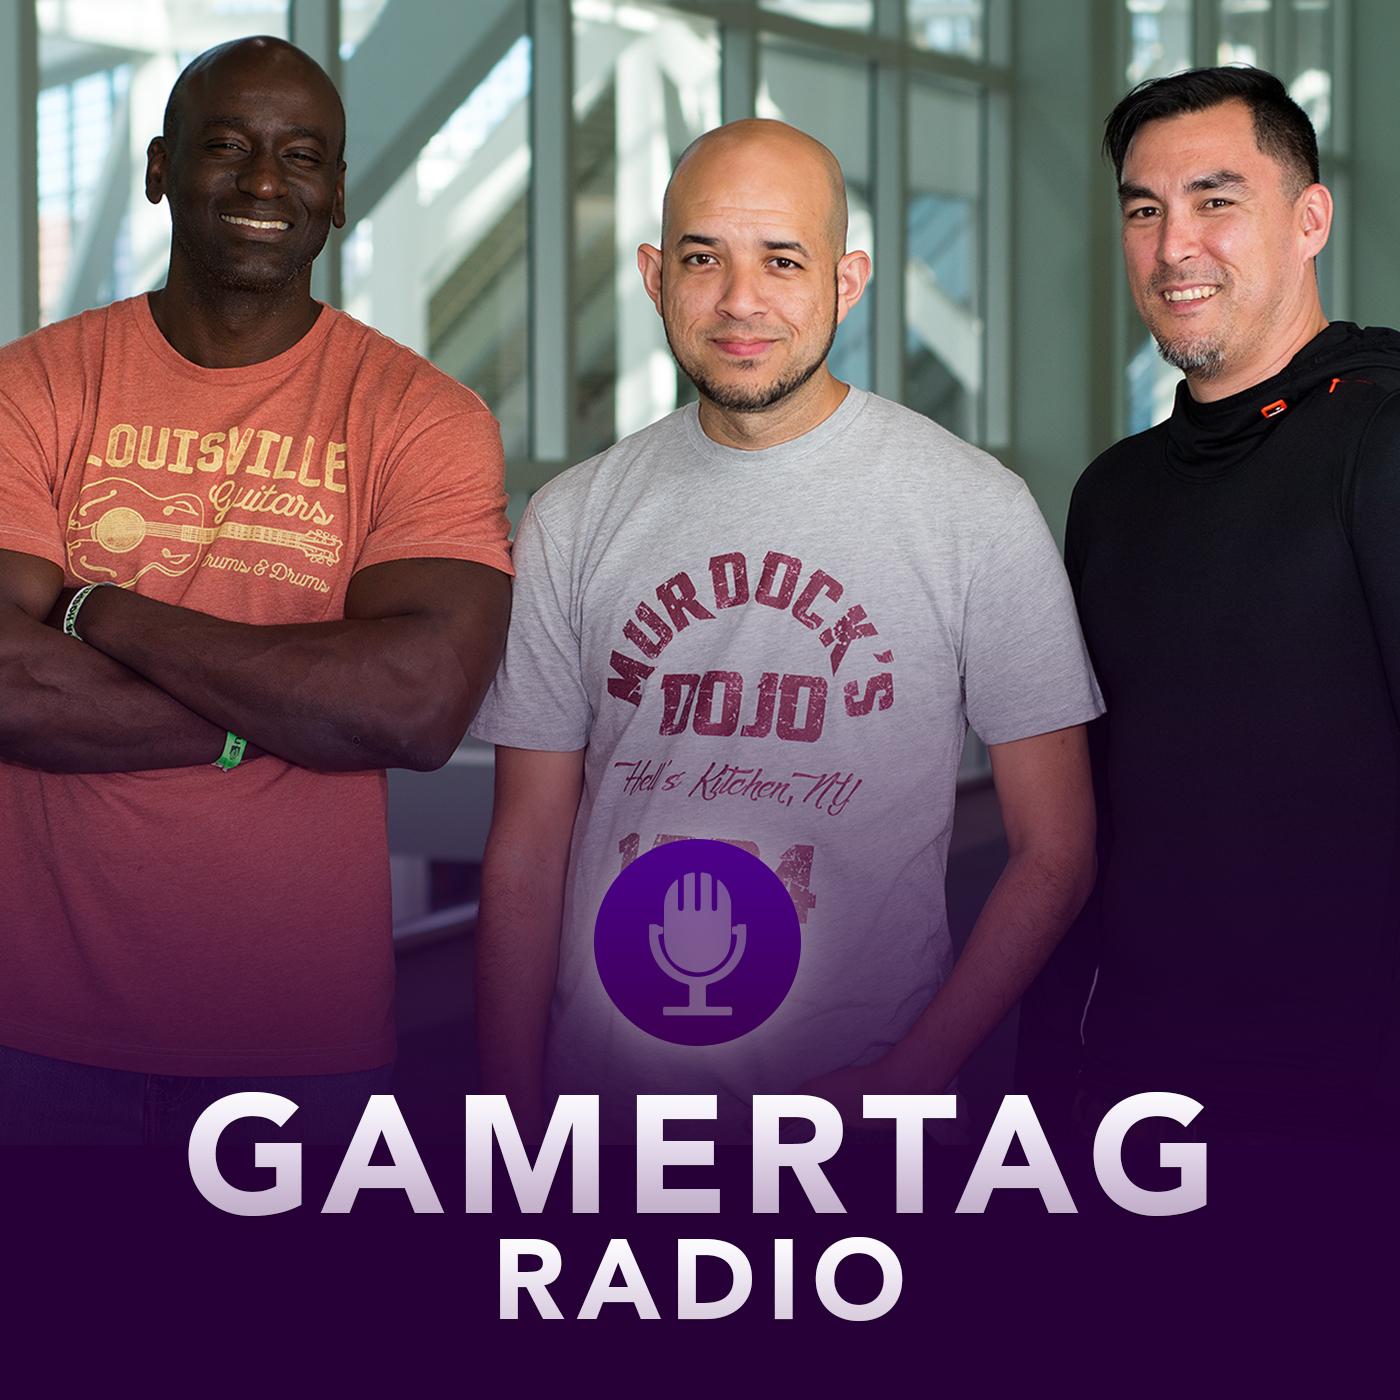 Avatar - Gamertag Radio